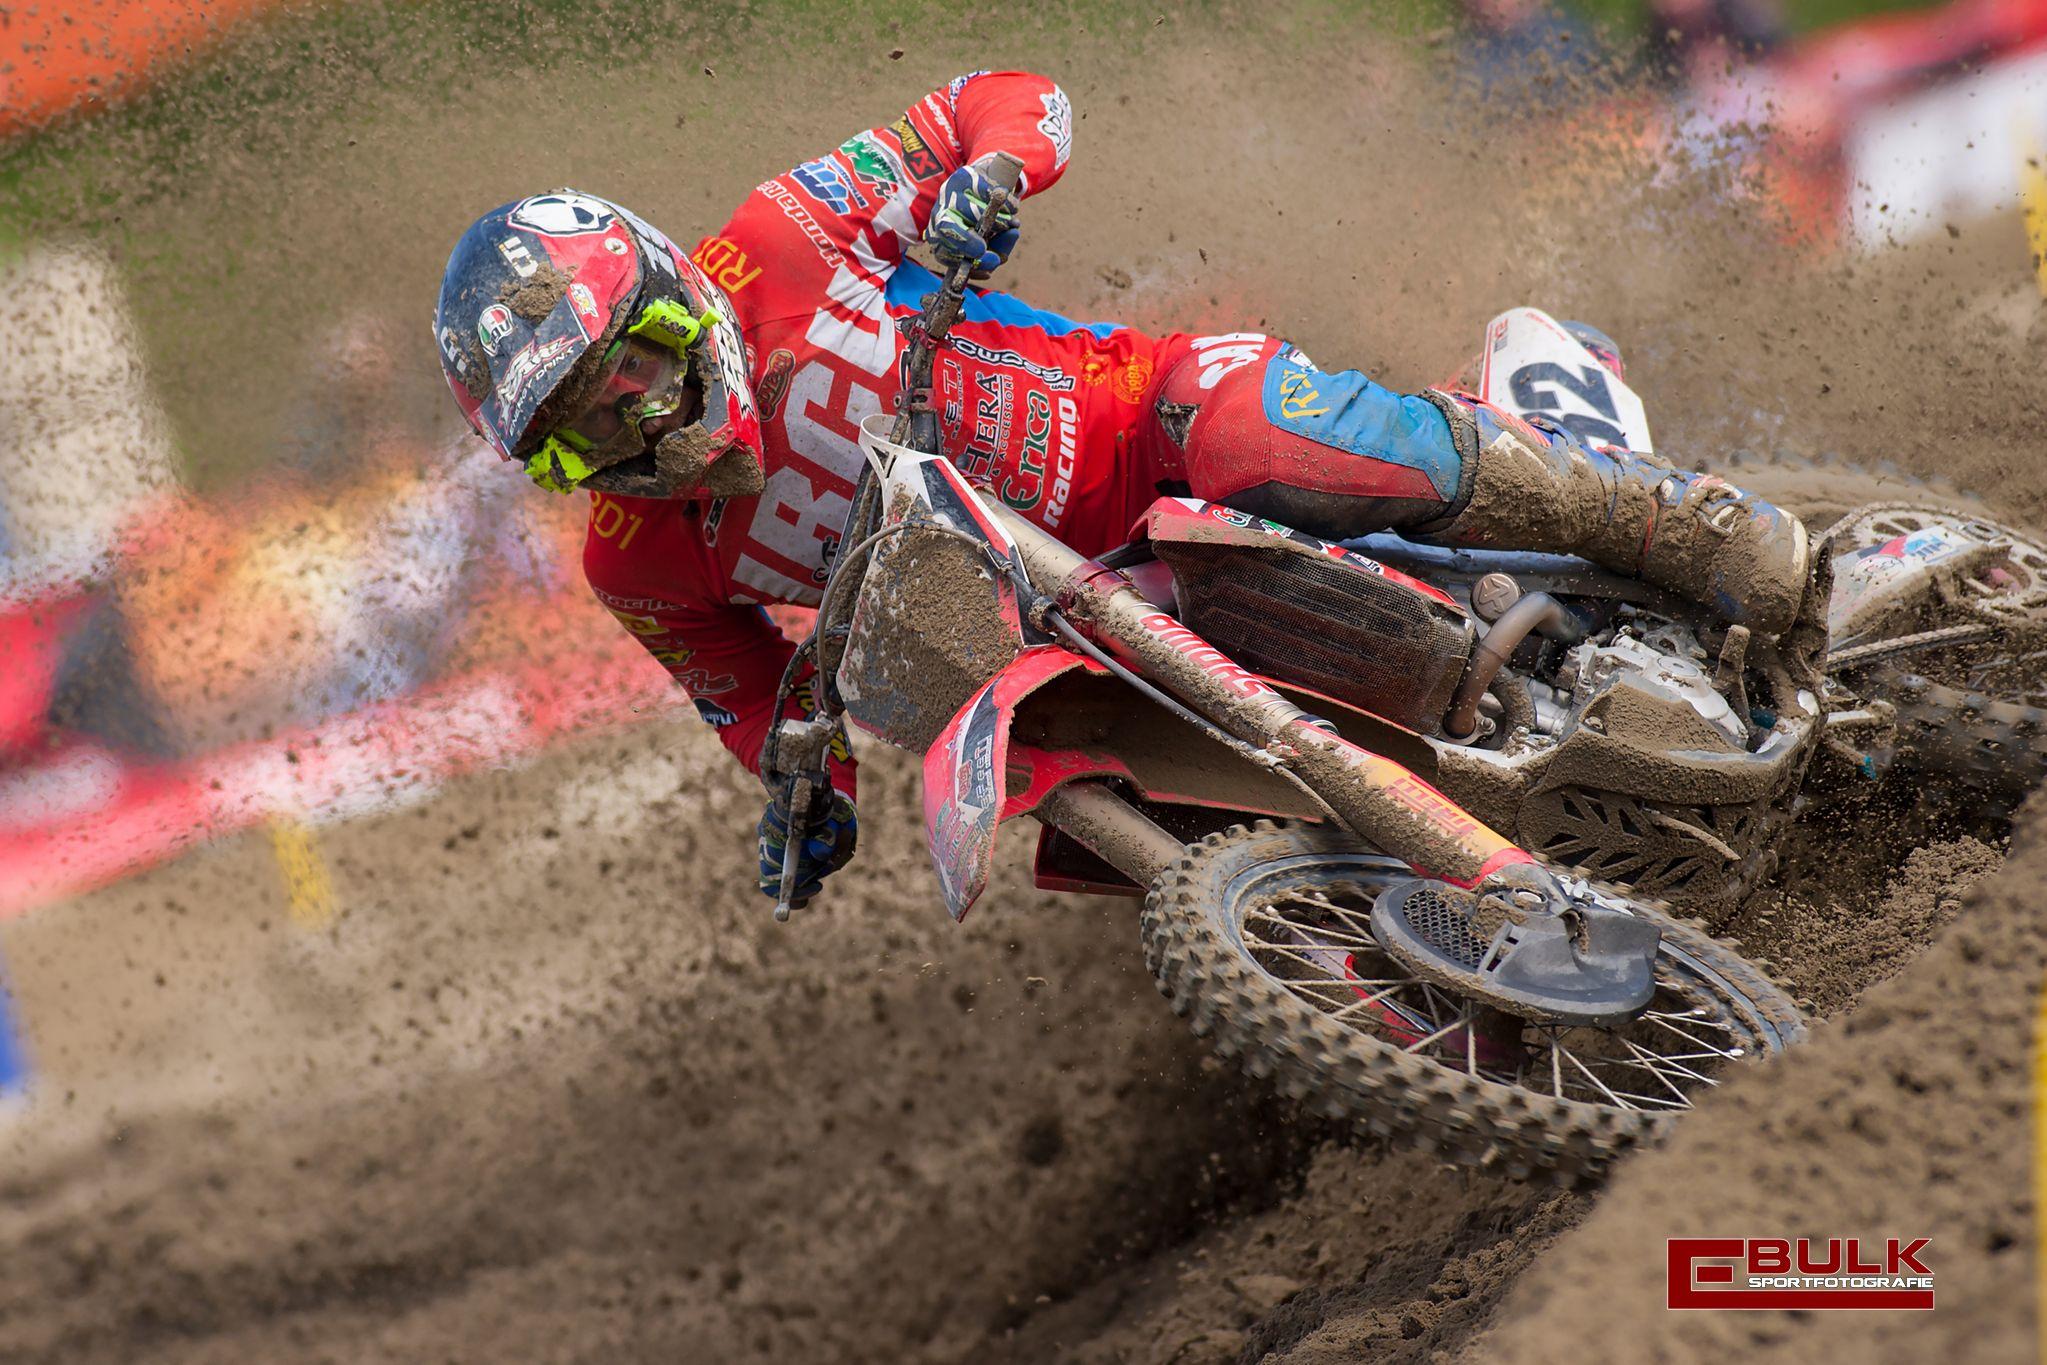 ebs_0772-ed_bulk_sportfotografie